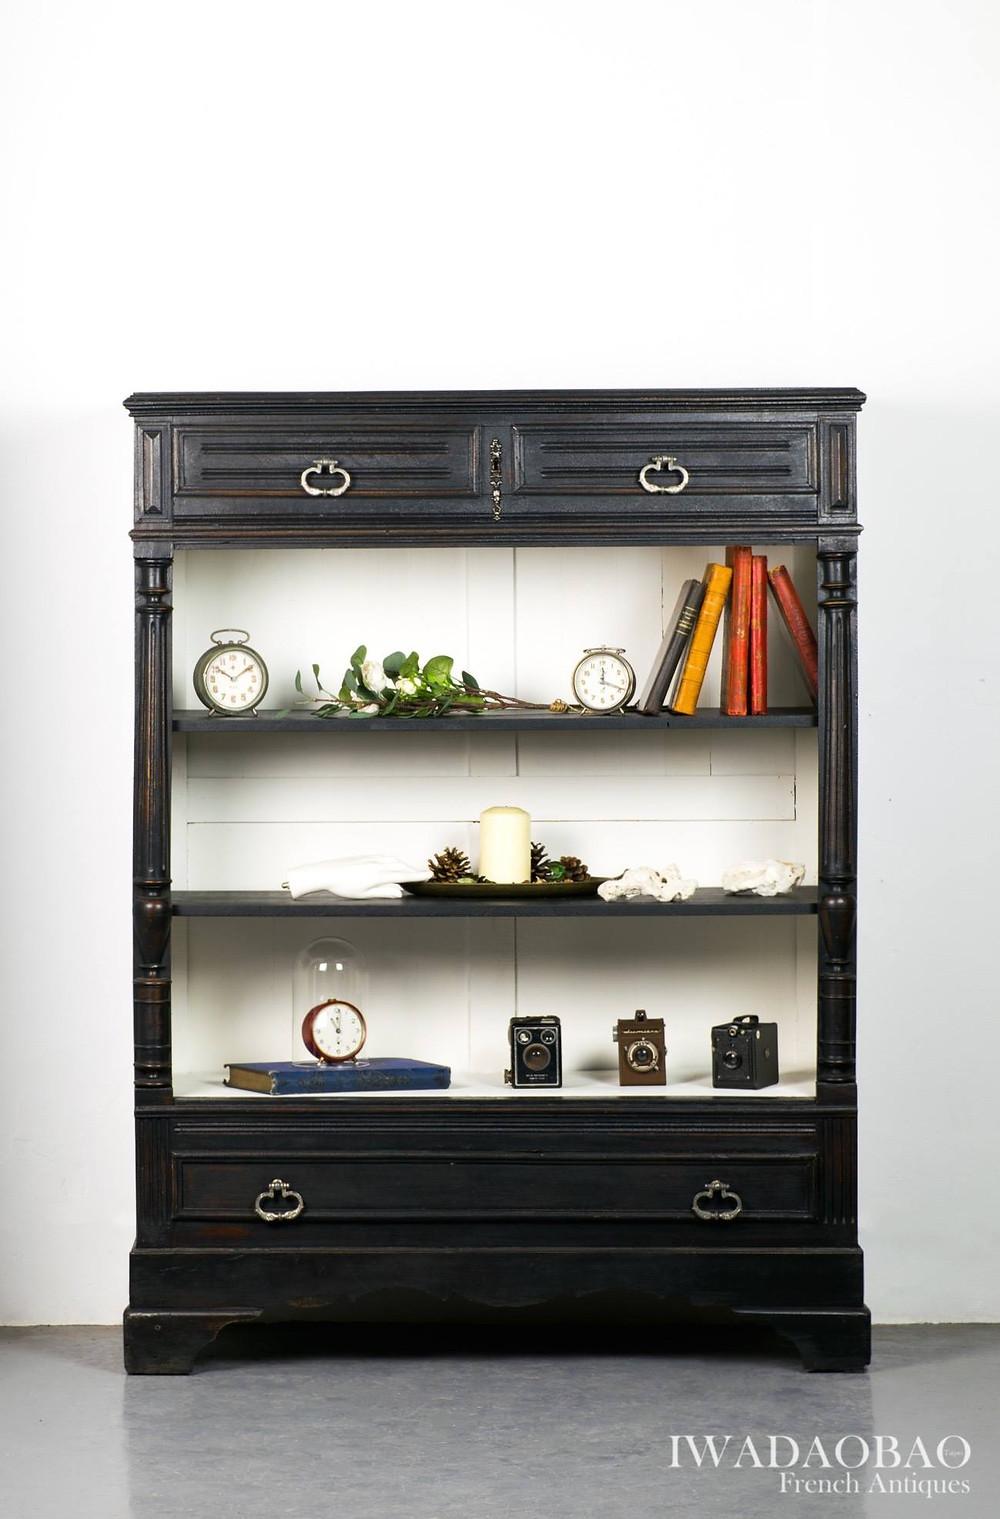 法國 Louis Philippe 古董展示櫃